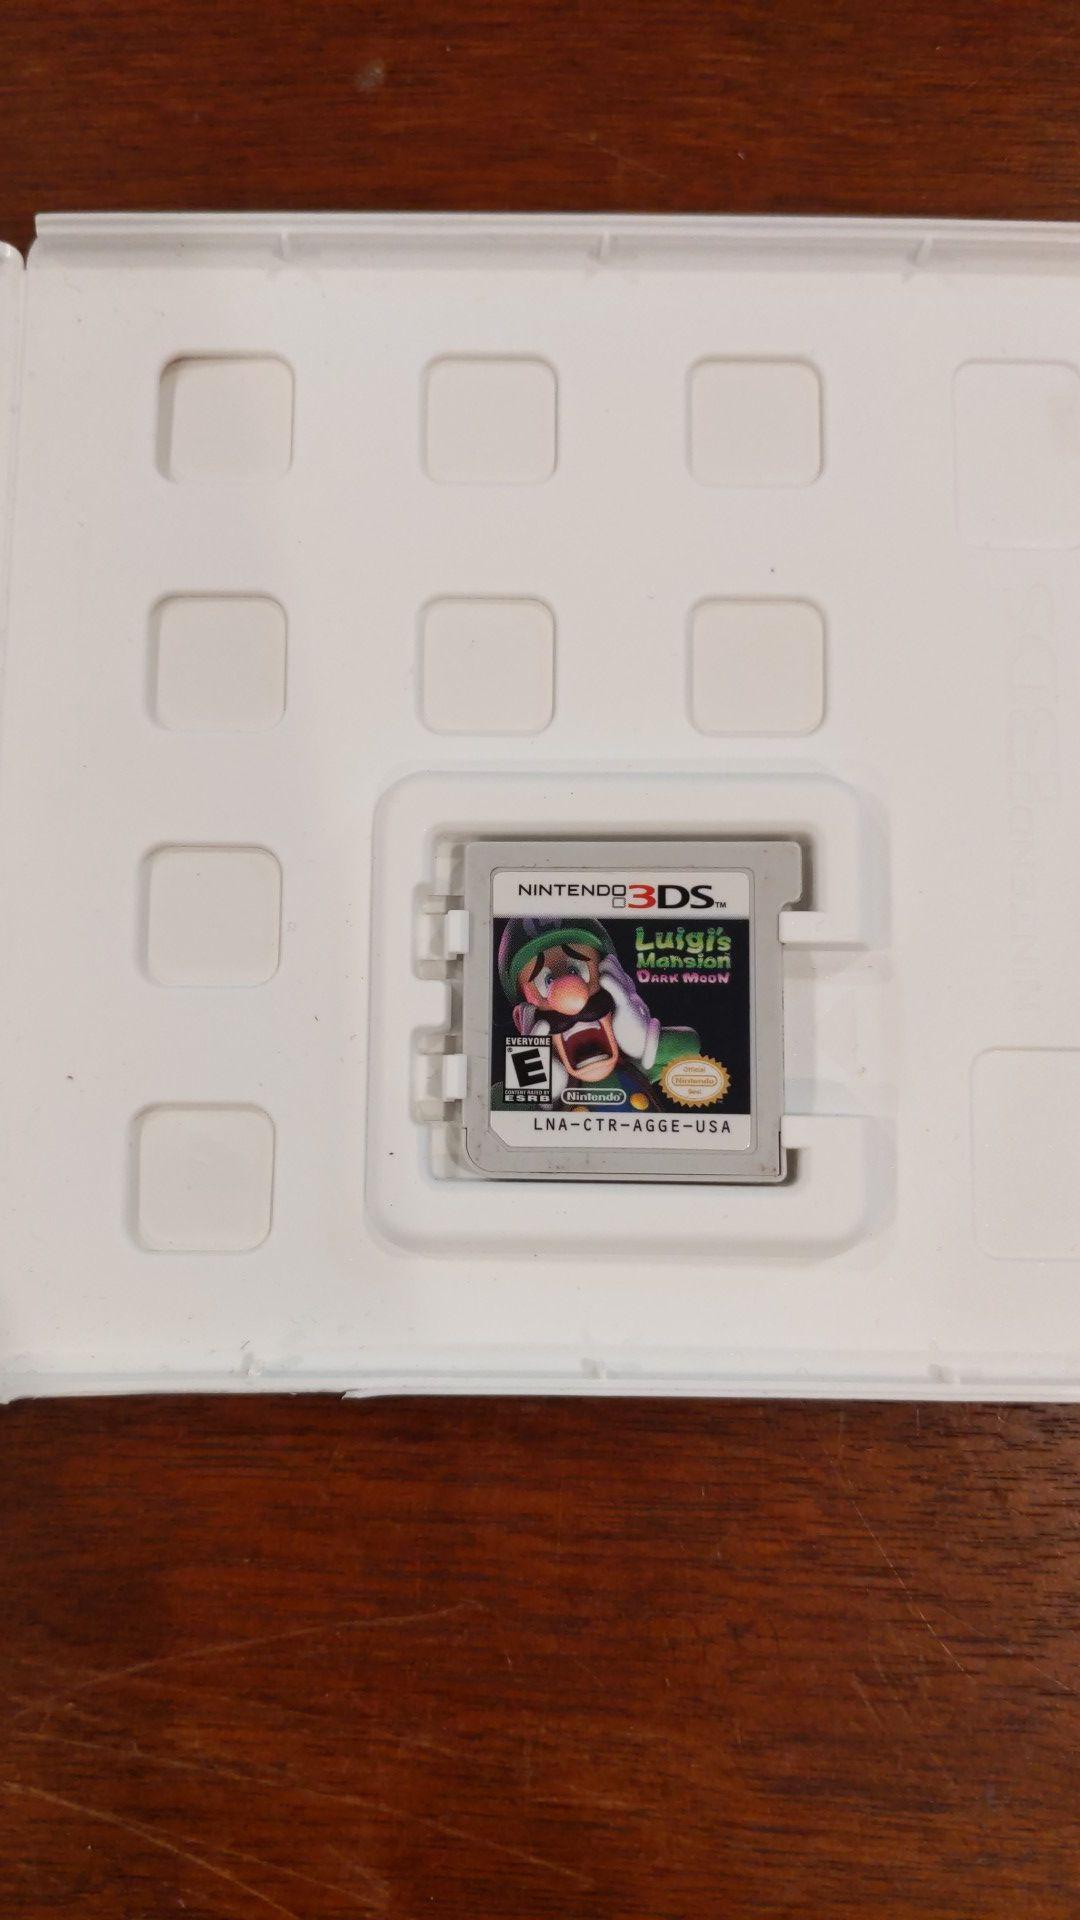 Luigi's Mansion dark moon for Nintendo 3ds